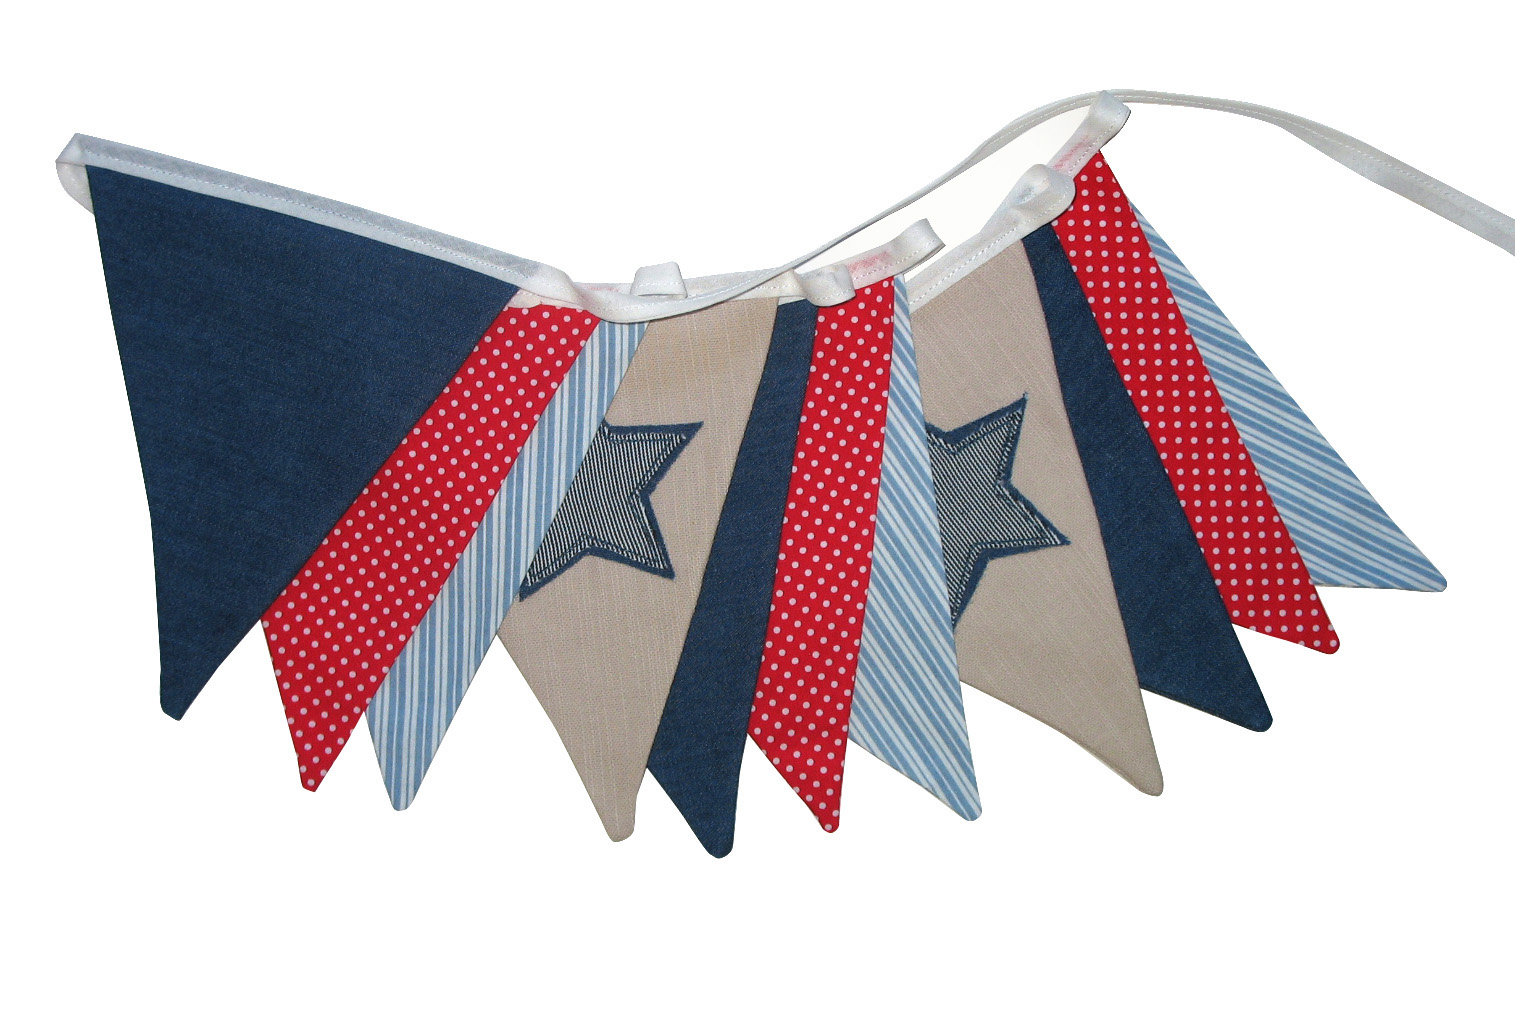 Merry Go Round Handmade Boys Star Flag Bunting Has Made